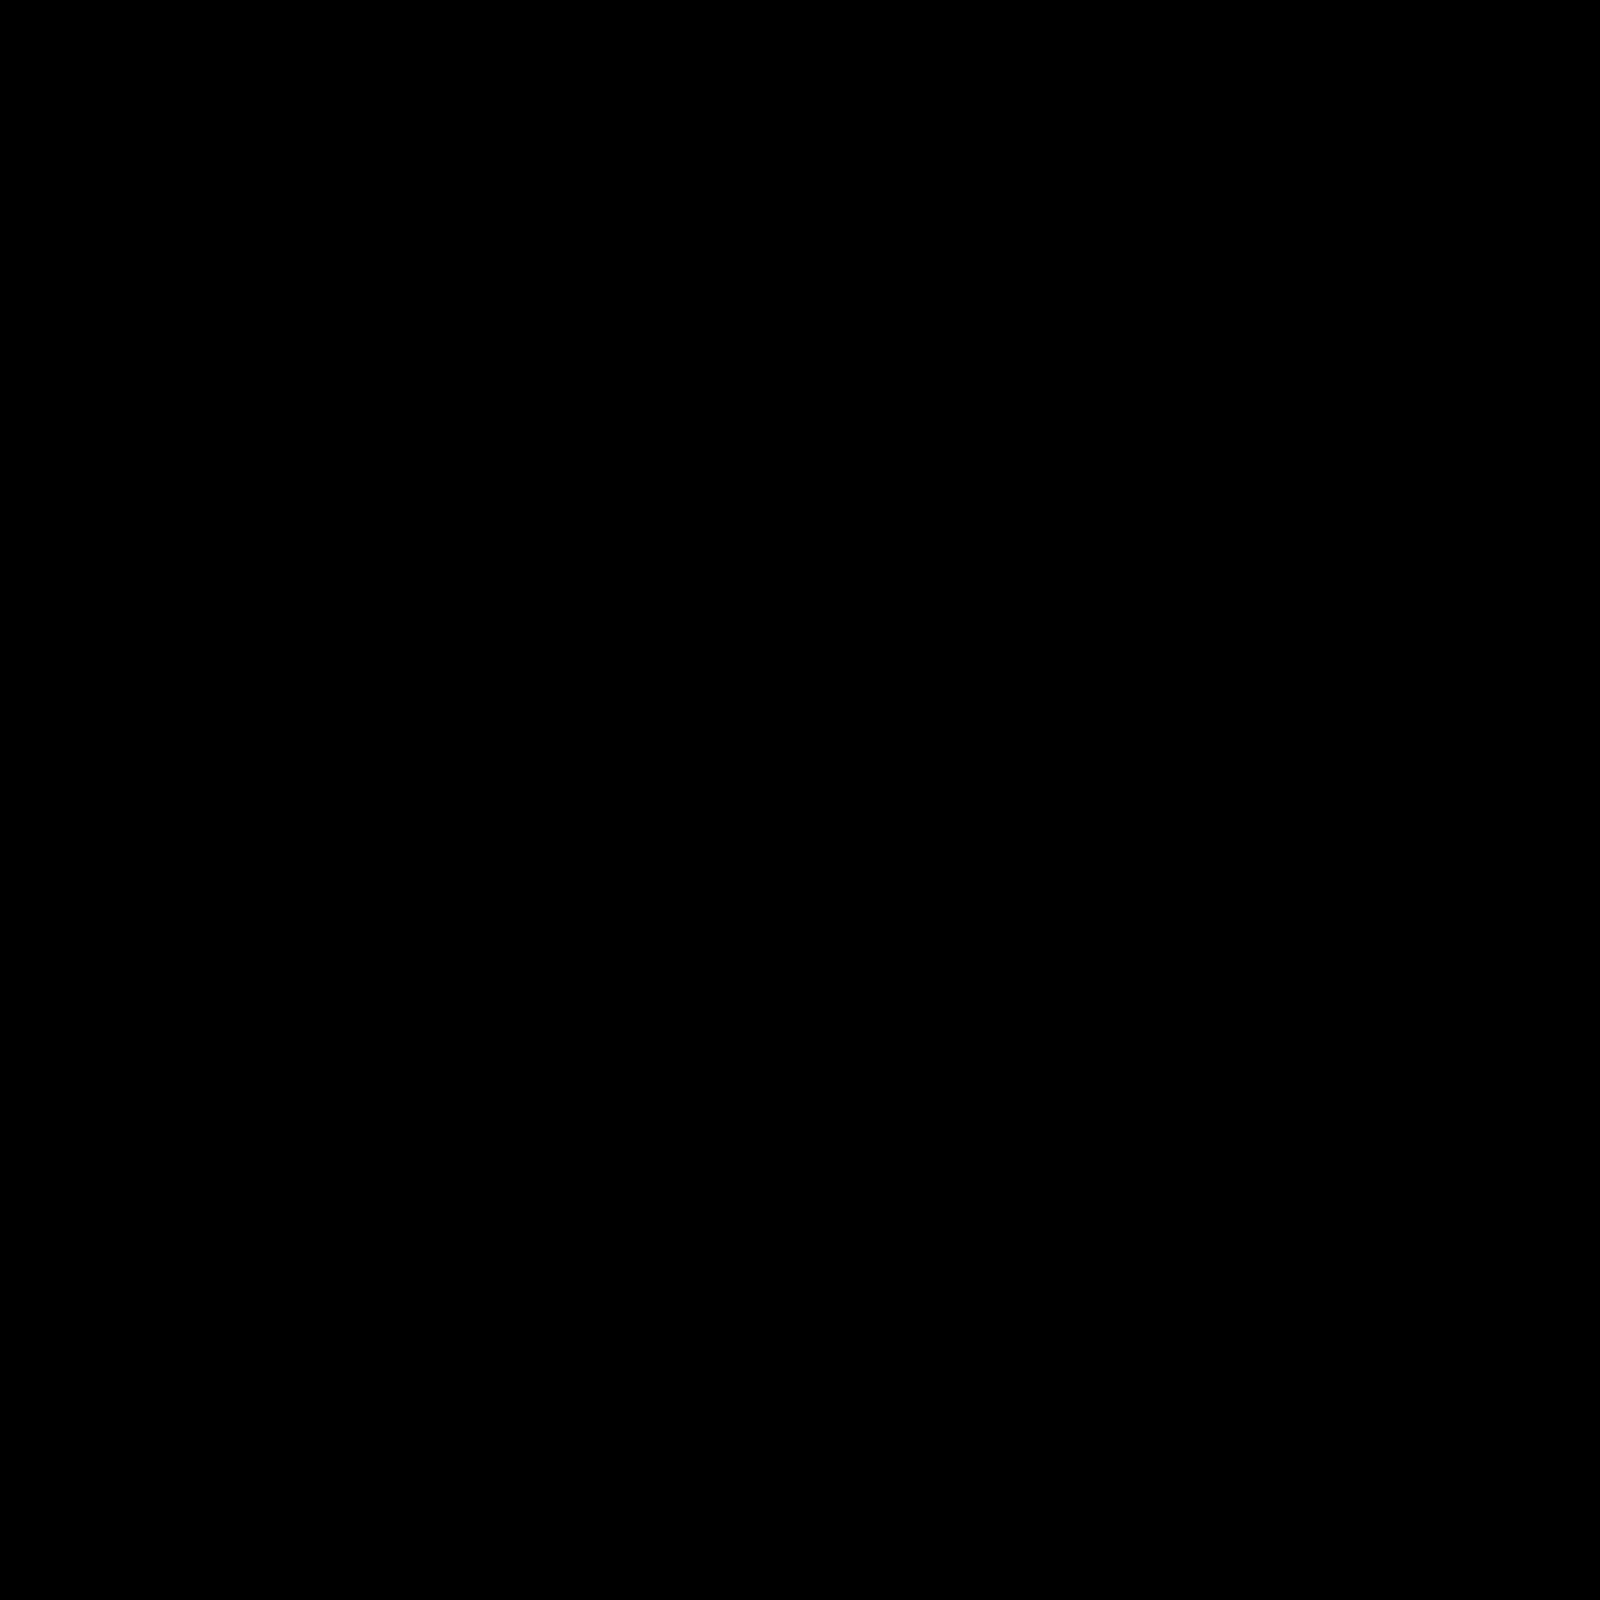 Scenic View icon